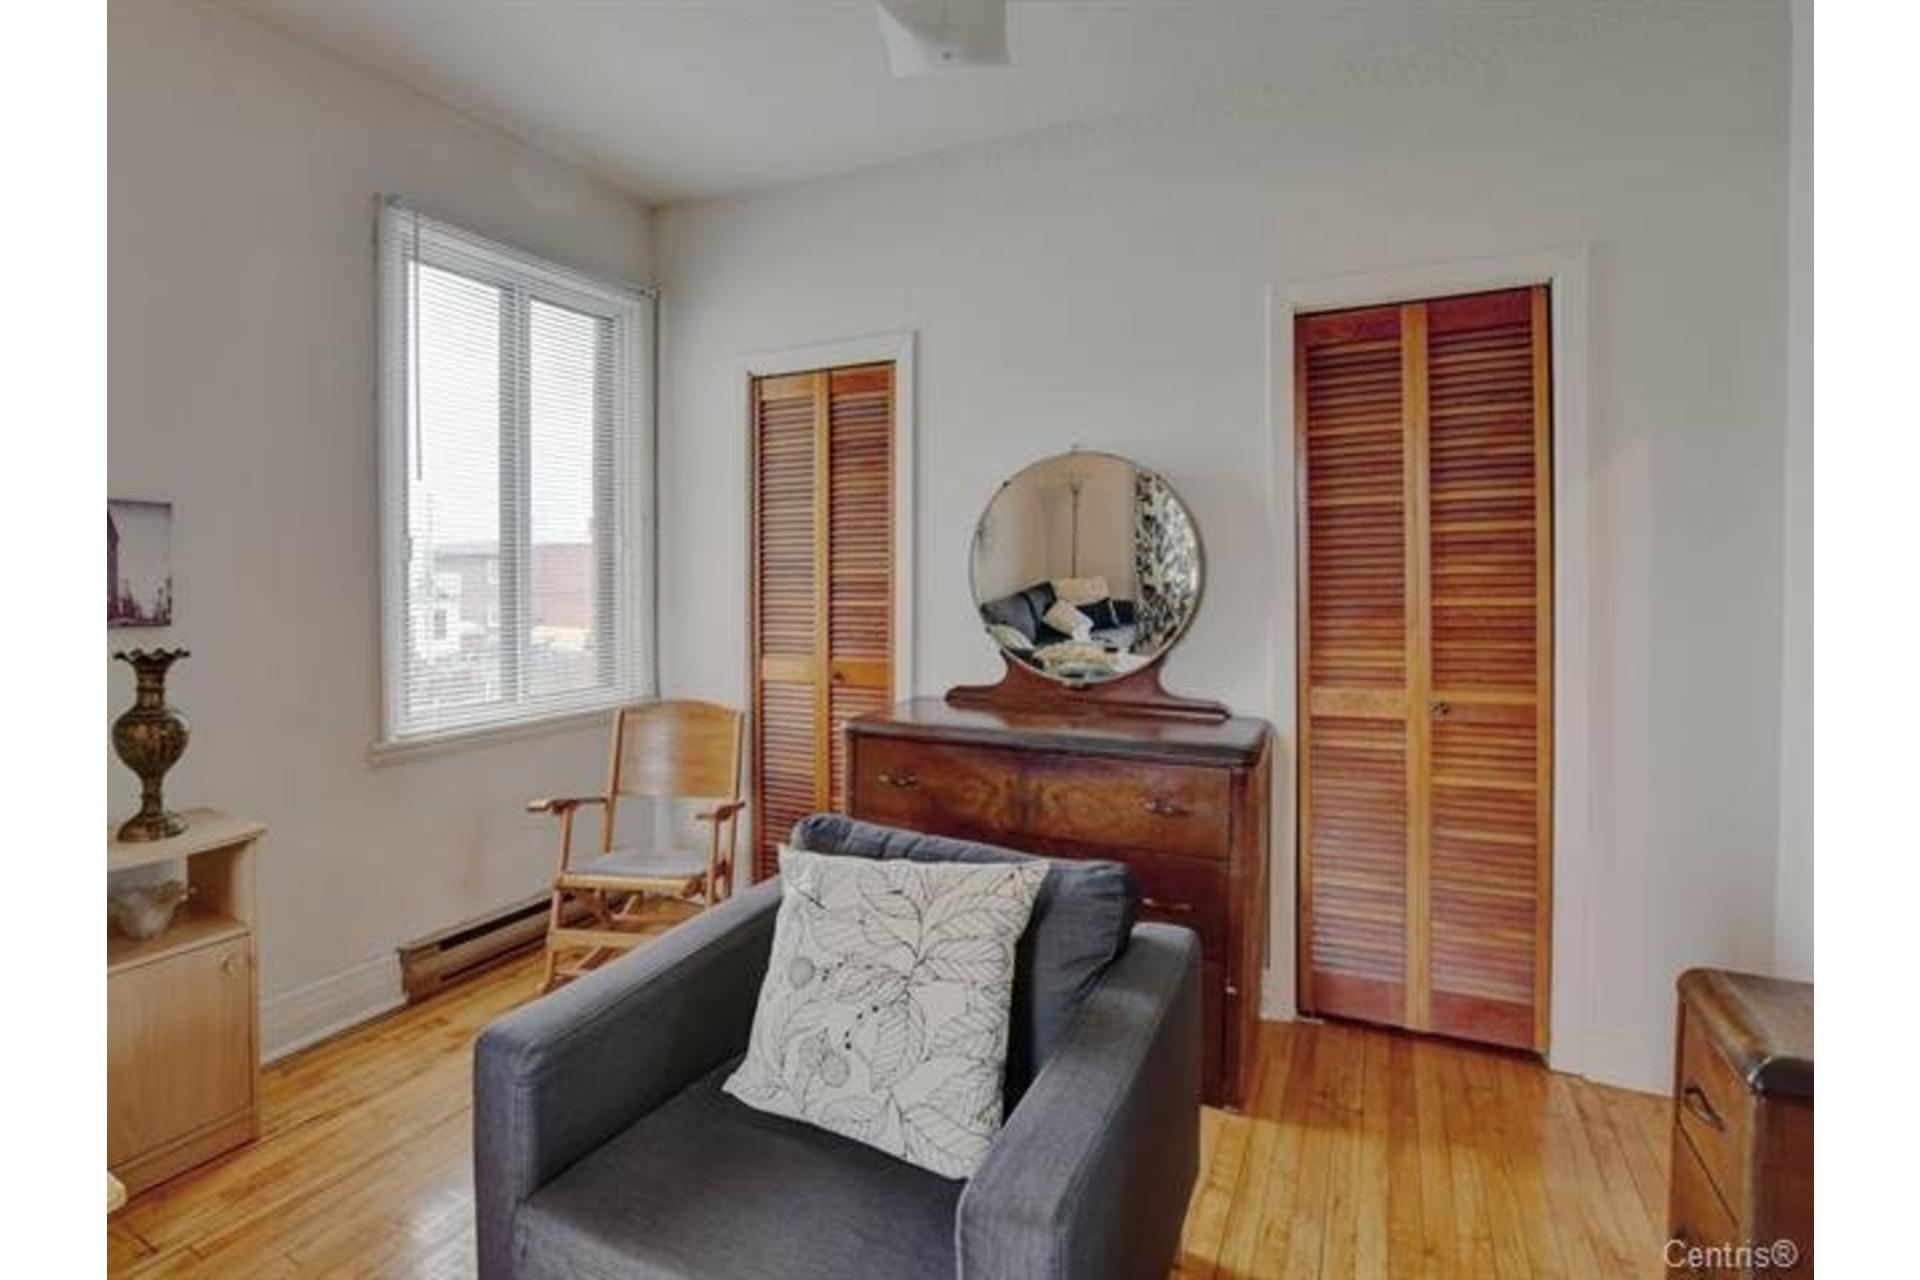 image 32 - Duplex En venta Lachine Montréal  - 6 habitaciones